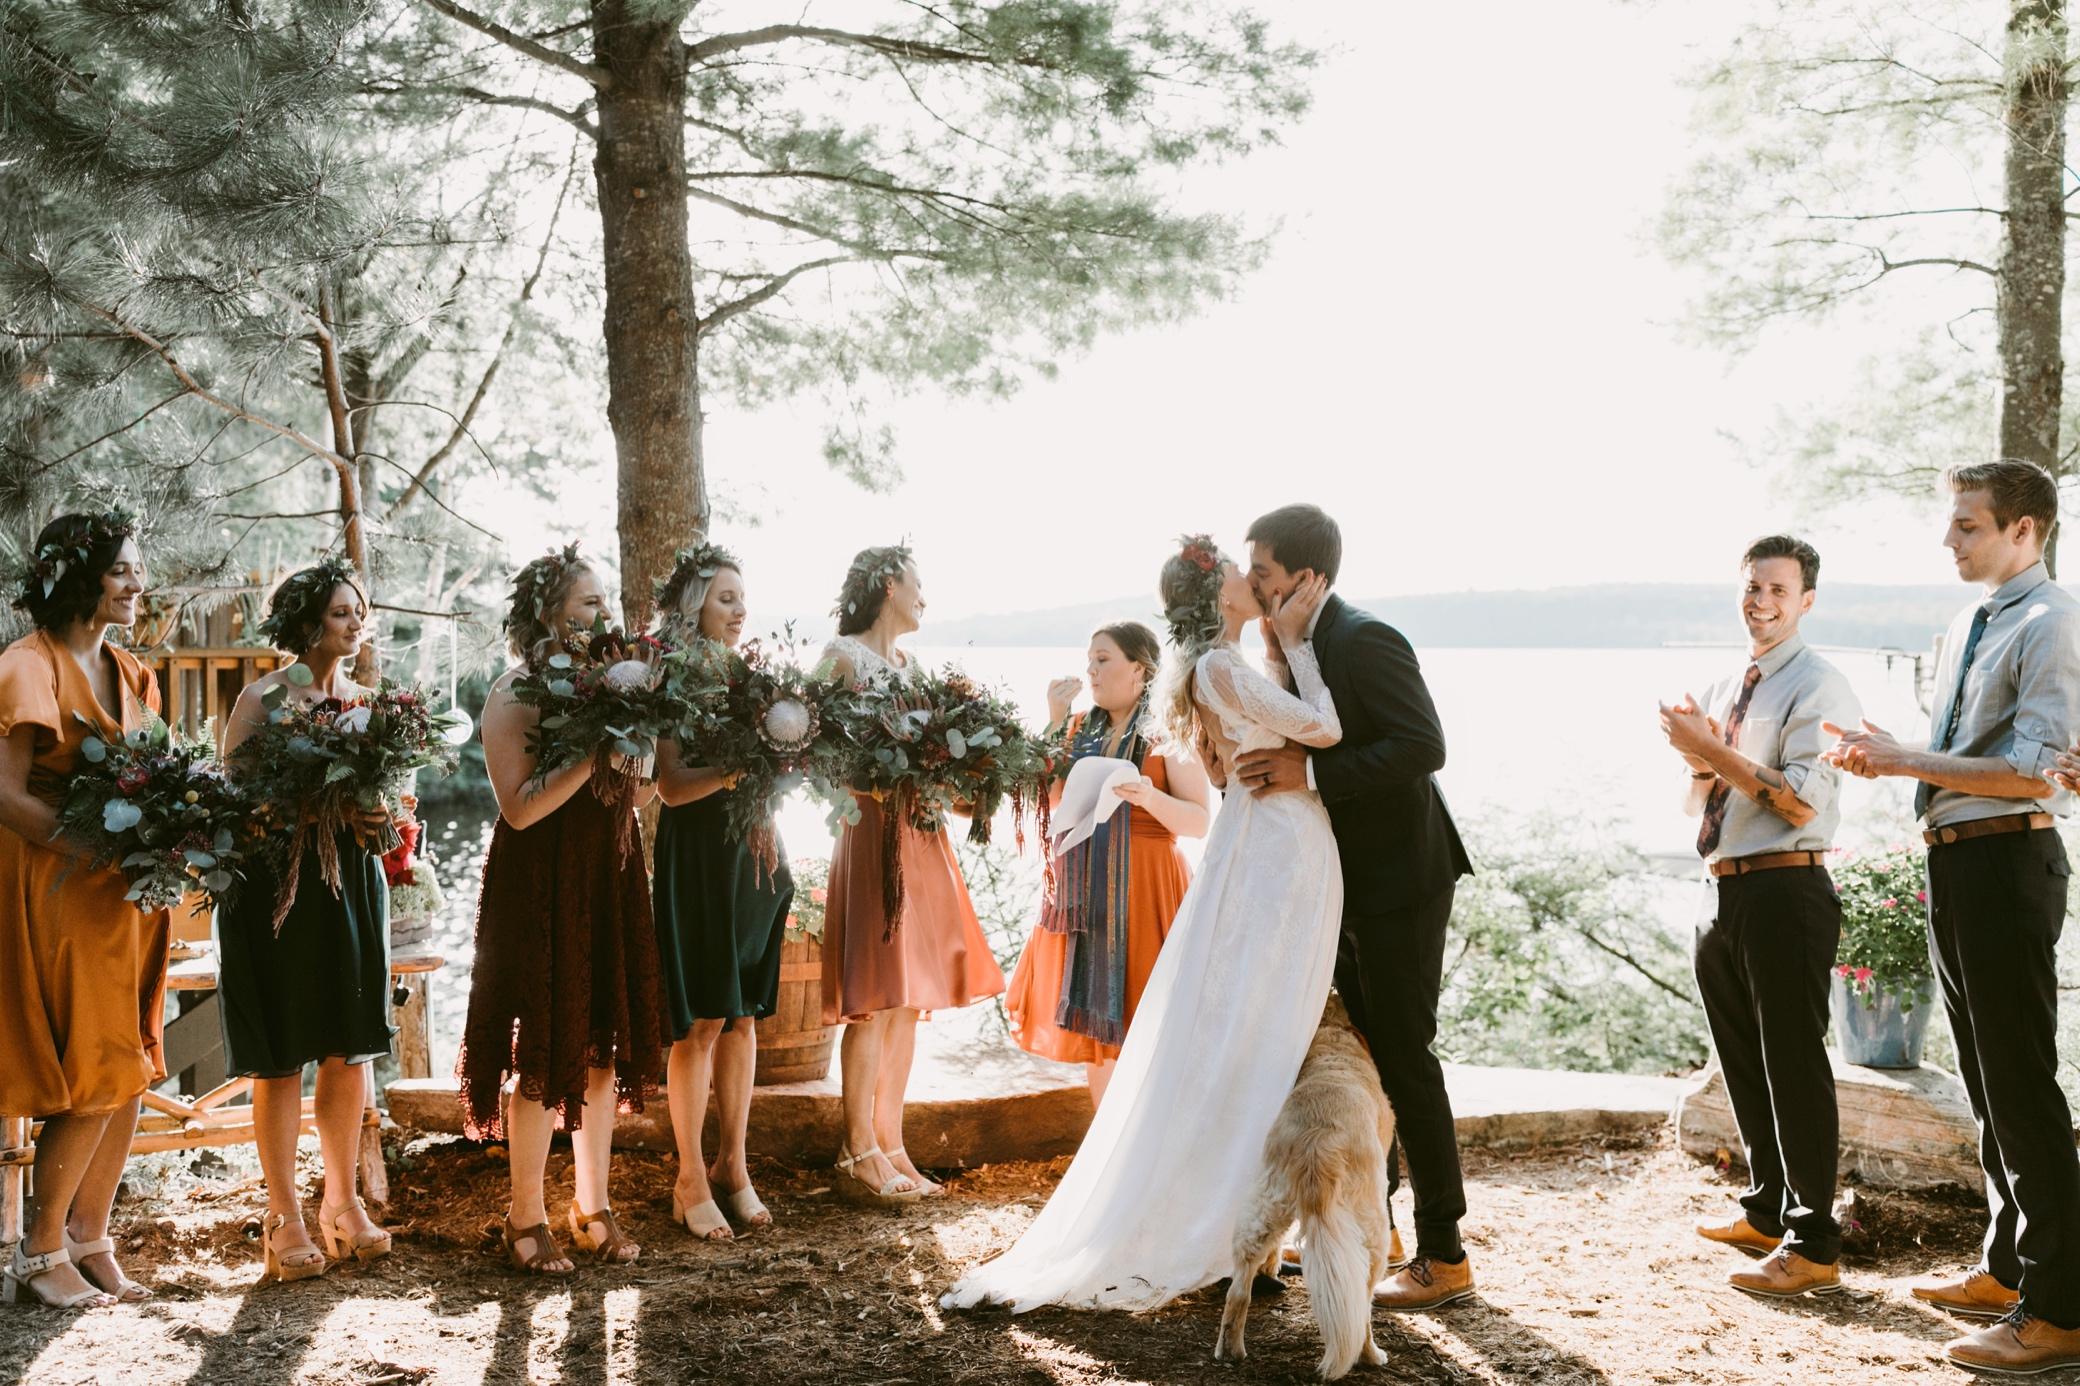 098_Huntsville Wedding  (463 of 689)_Ontario_Cottage_Huntsville_Wedding.jpg